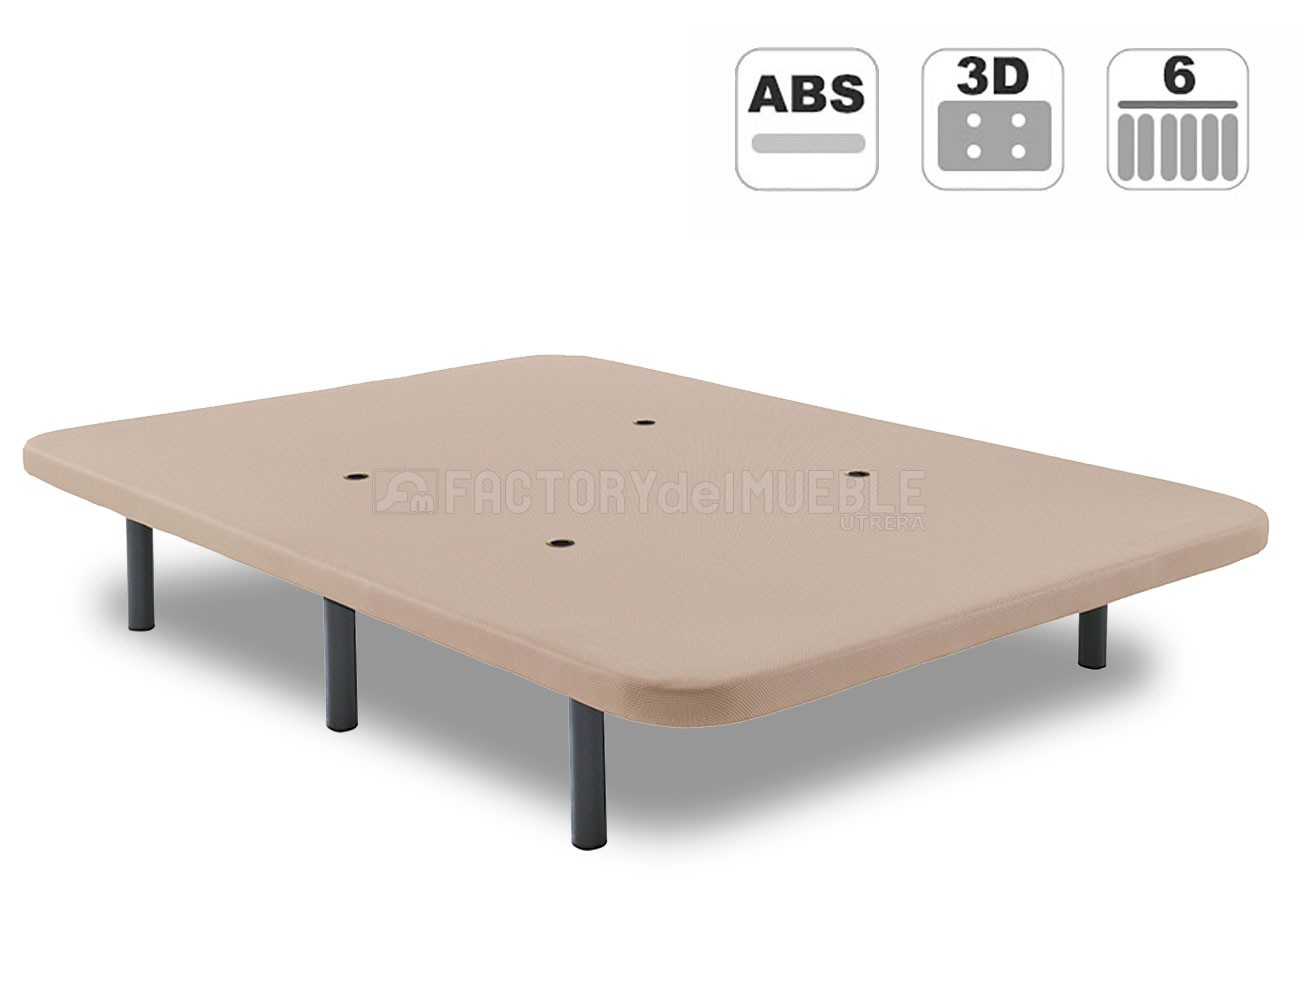 Base tapizada 3d valvulas aireacion abs beig